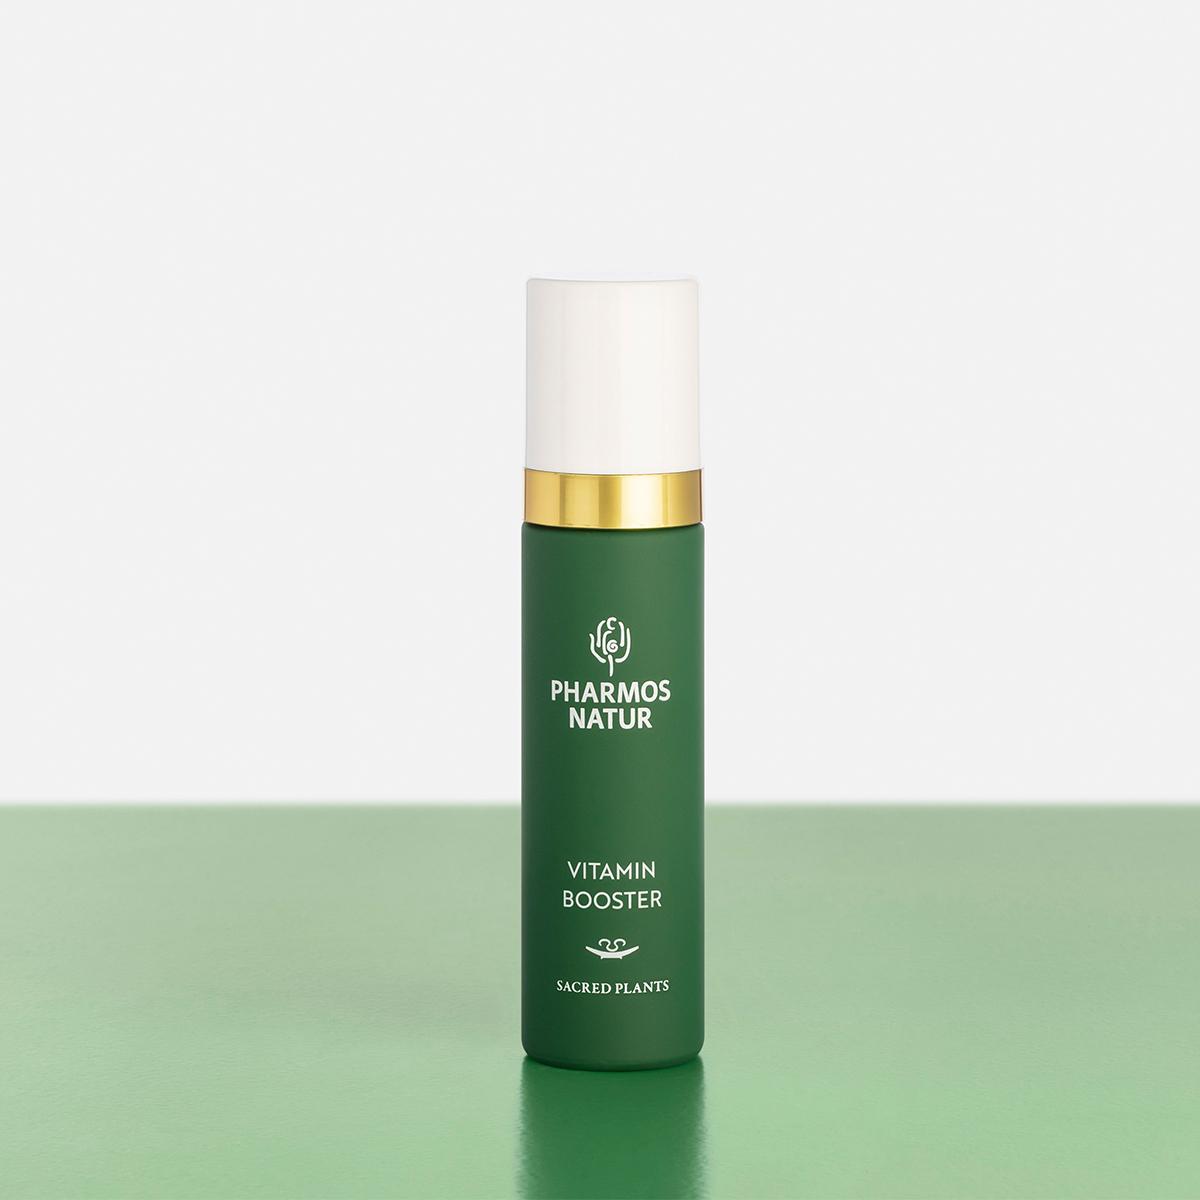 grüner Vitamin Booster Produktbild